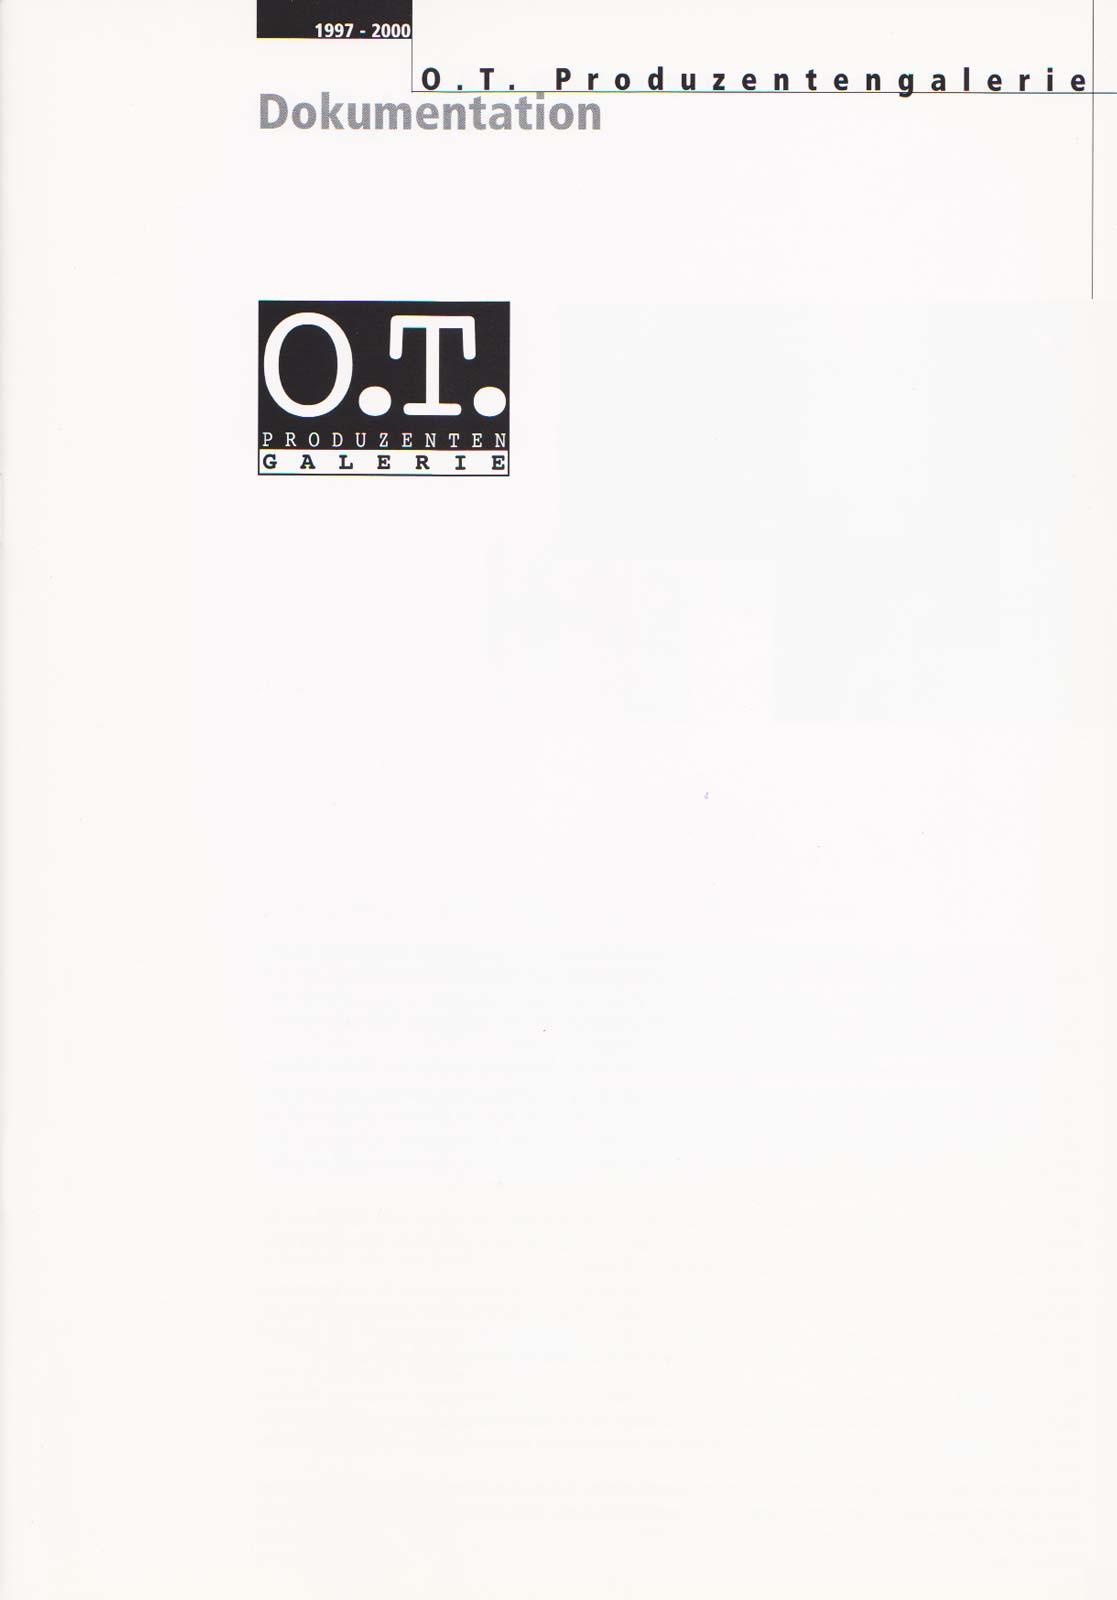 Shows der O.T. Produzentengalerie Saarbrücken.